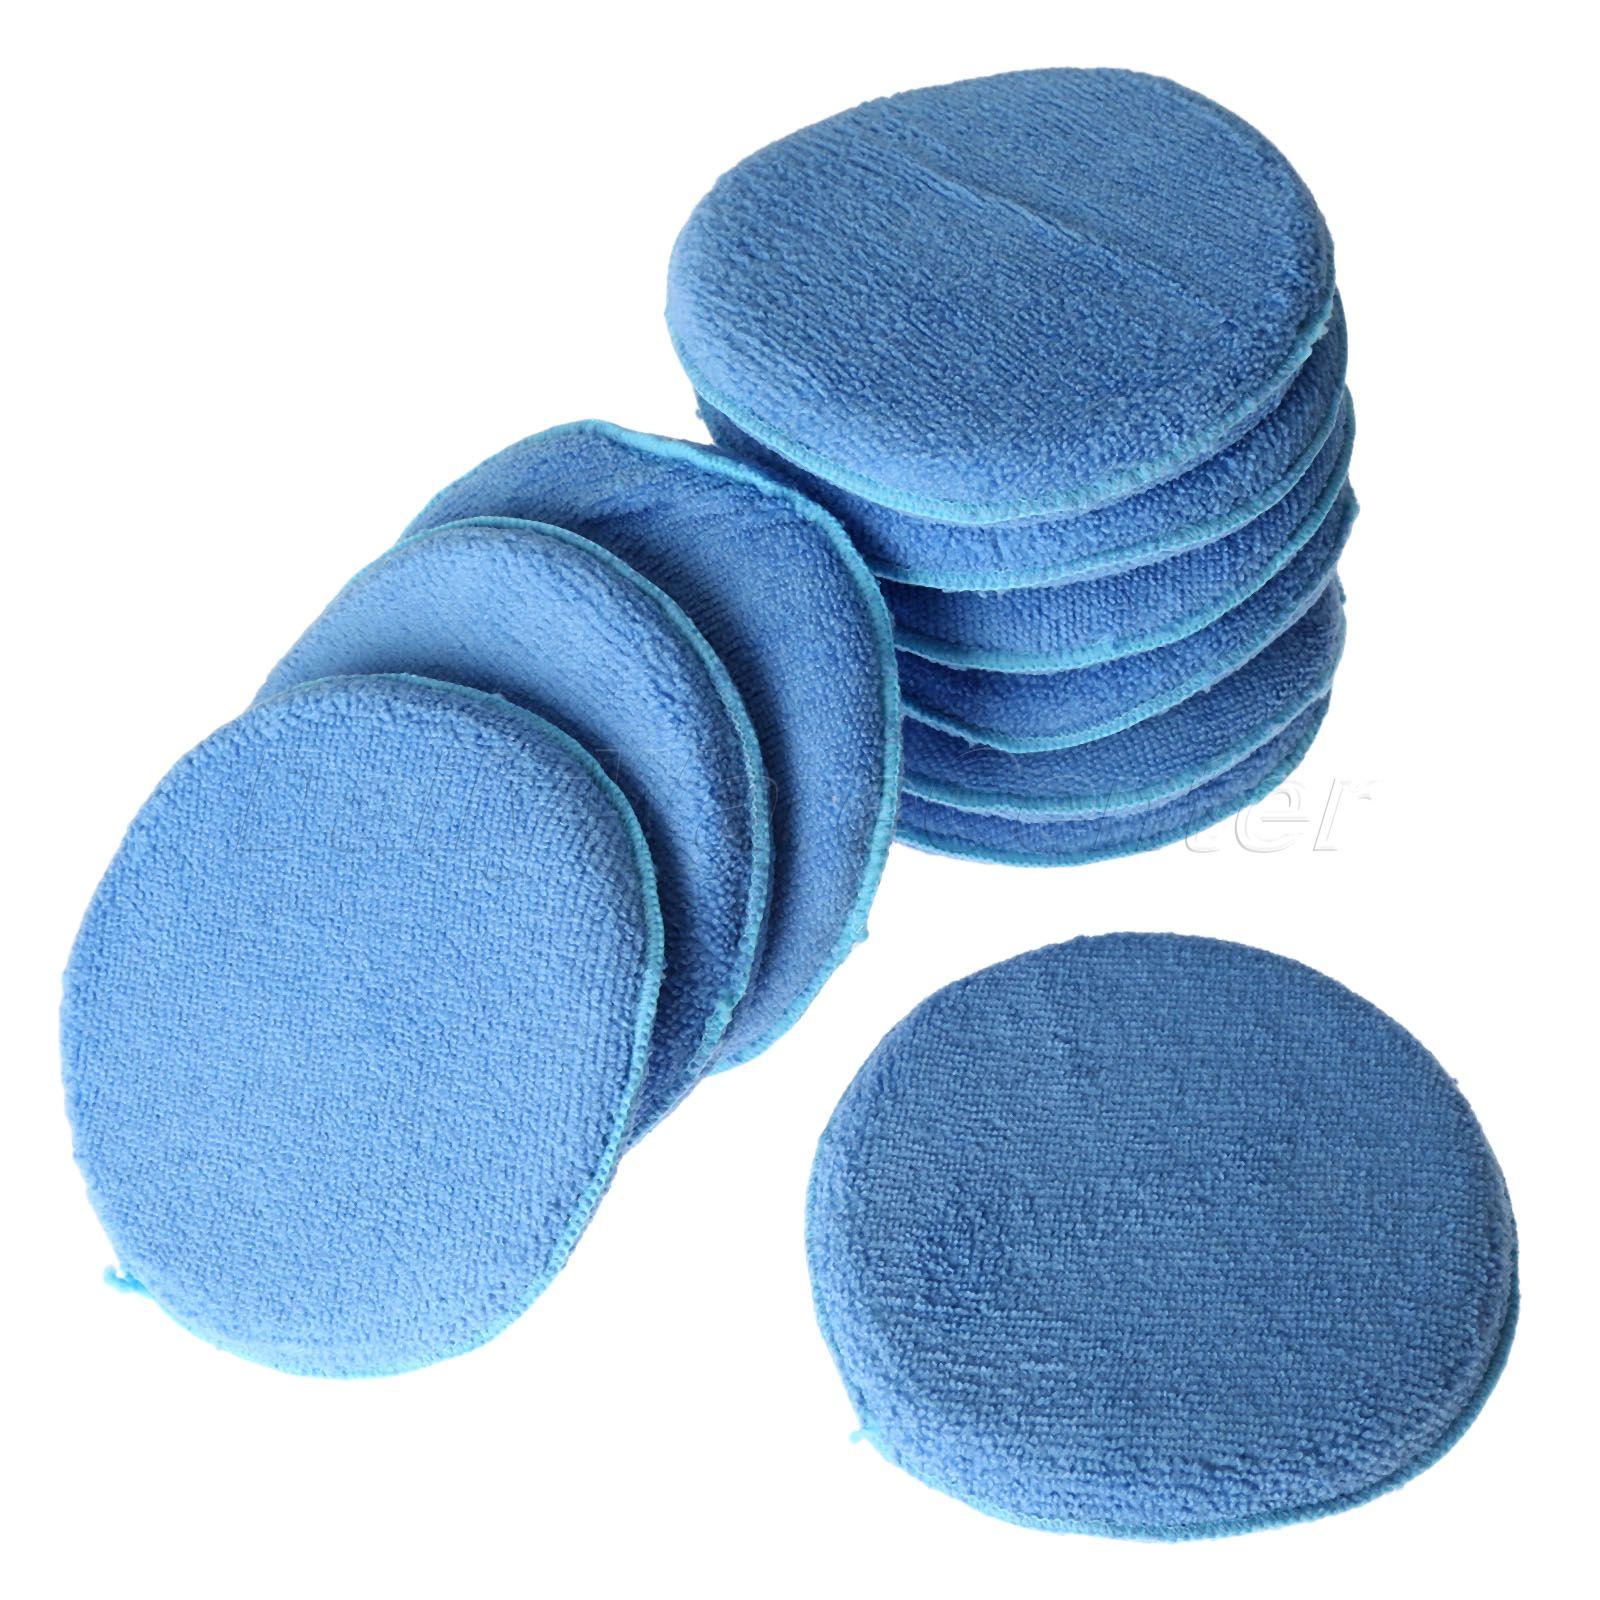 10Pcs 6 Microfiber Foam Sponge Waxing Buffing Polishing Pads for Car Care Clean